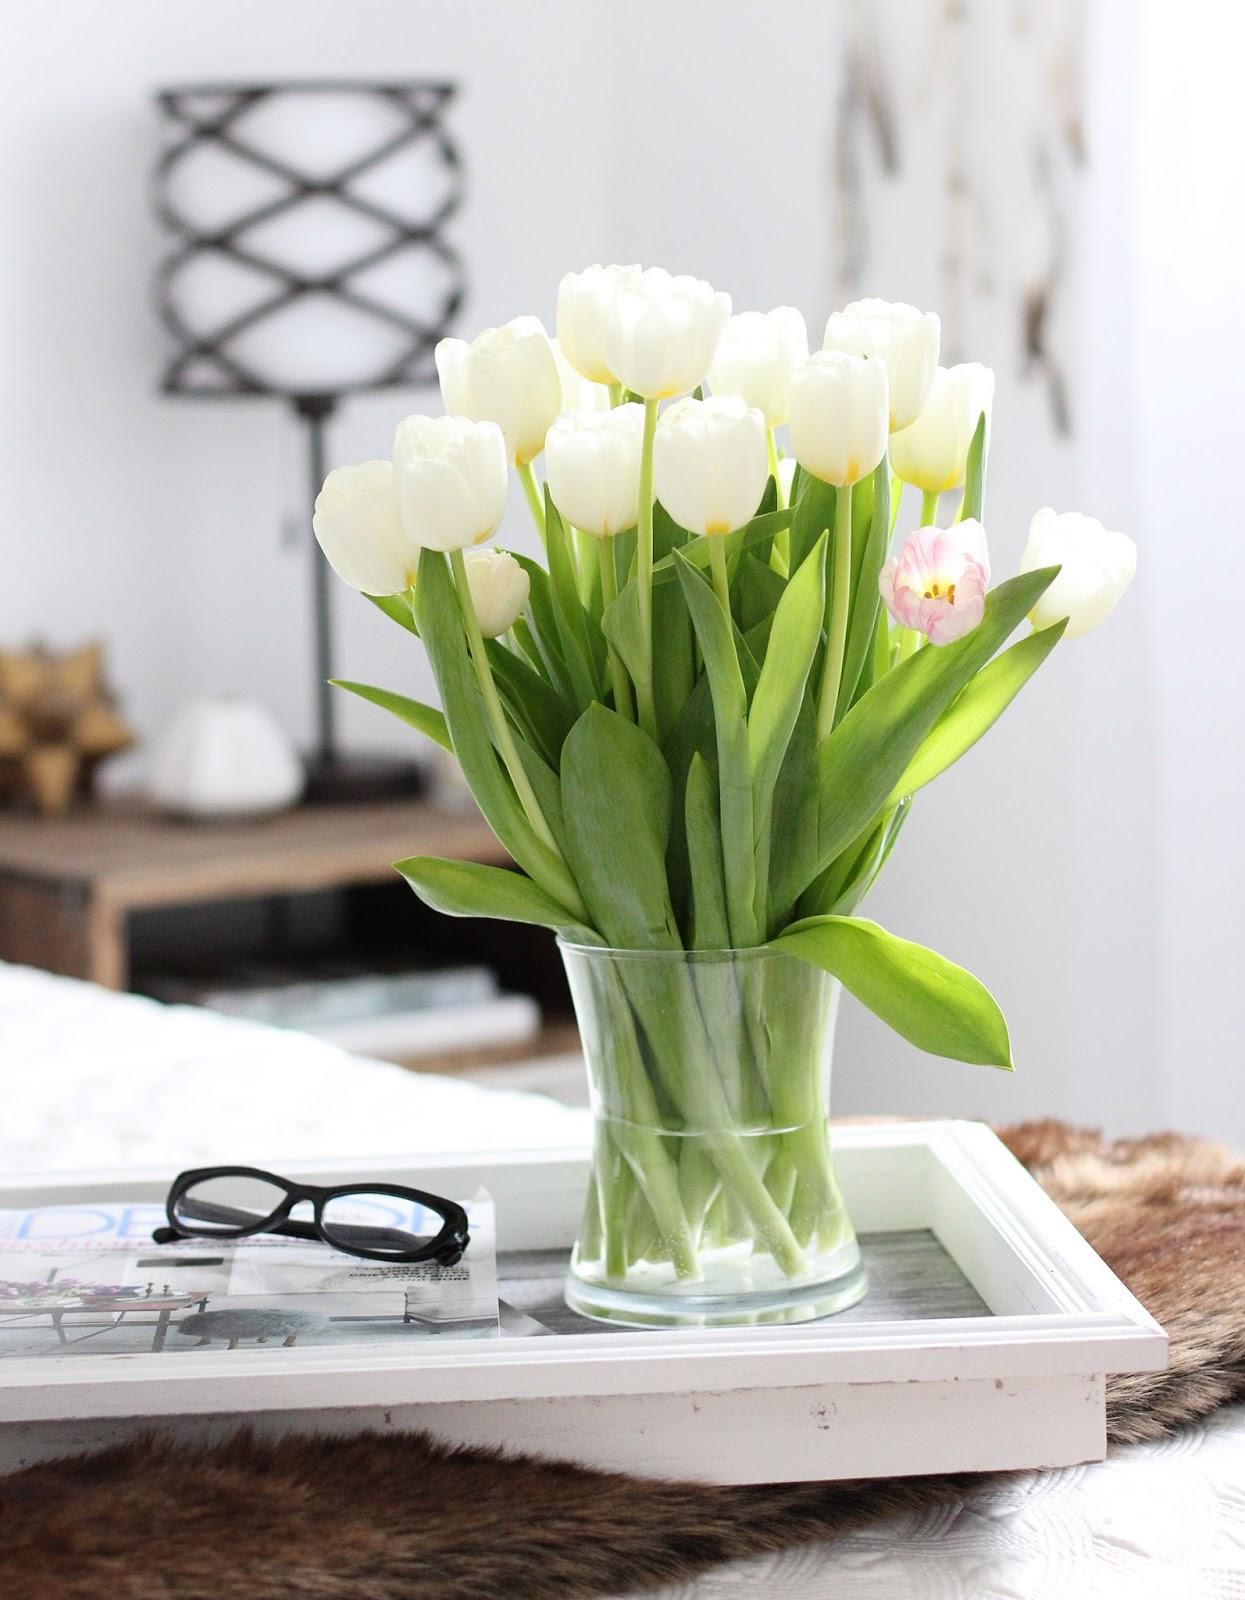 Tulips-Spring-Arrived